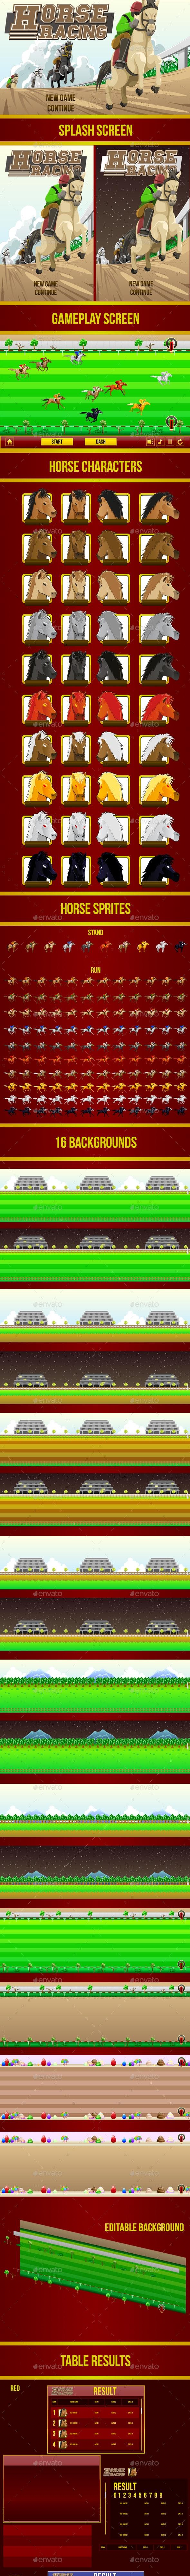 Horse Racing Game Assets - Sprites Game Assets